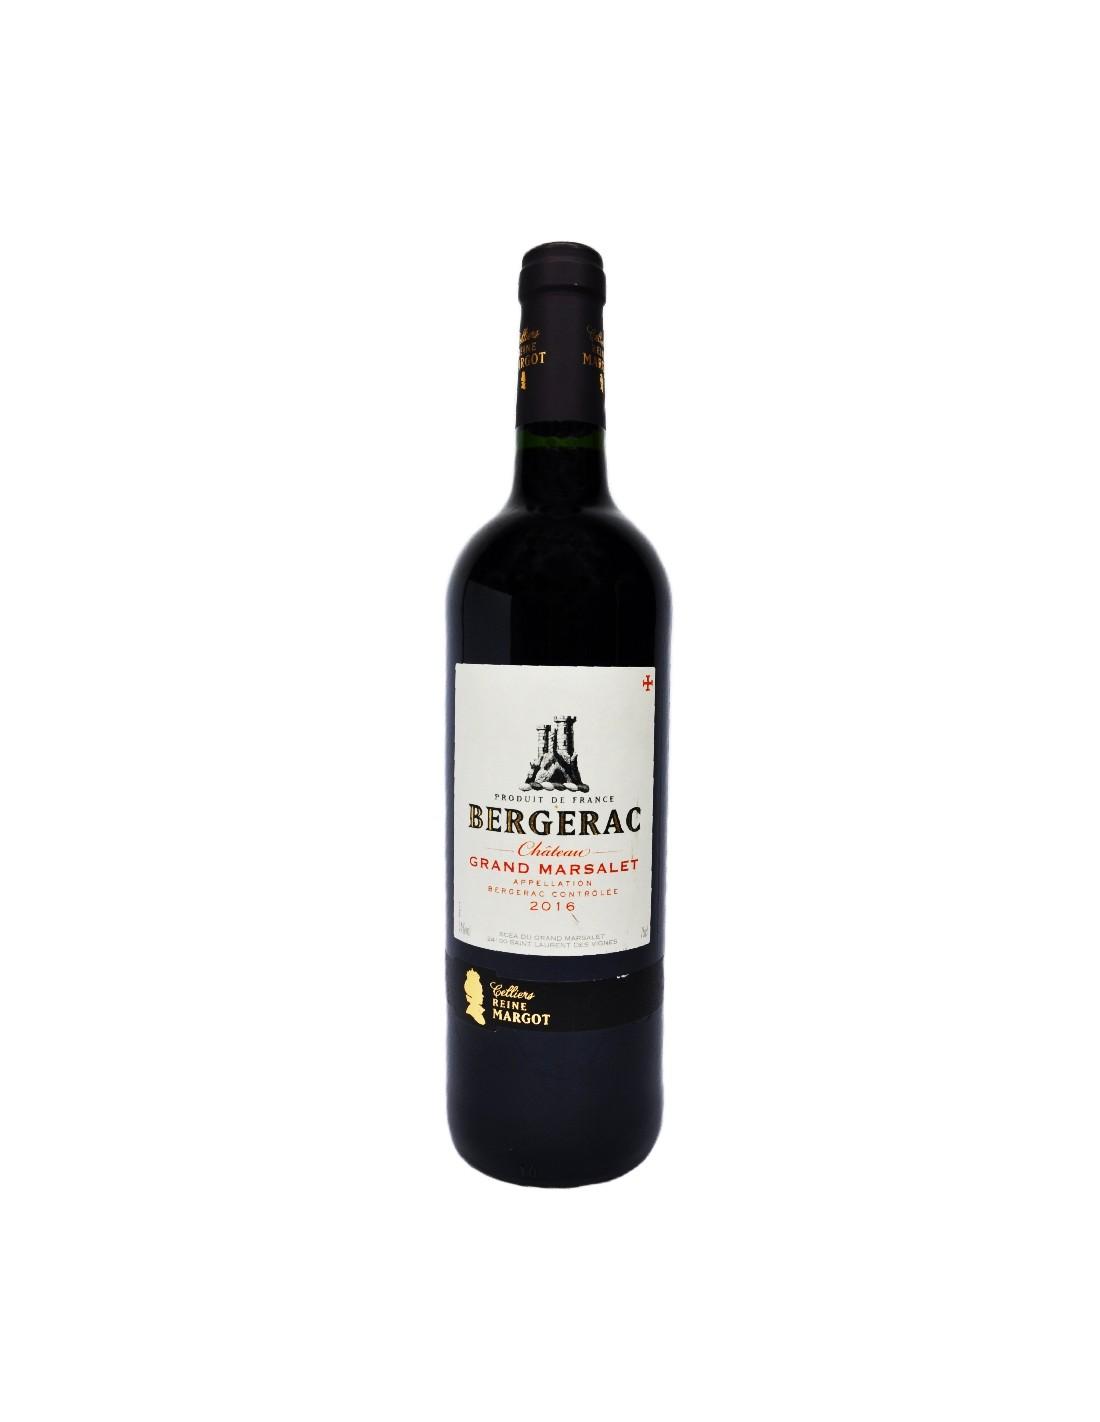 Vin rosu Bergerac Chateau Grand Marsalet, 14% alc., 0.75L, Franta